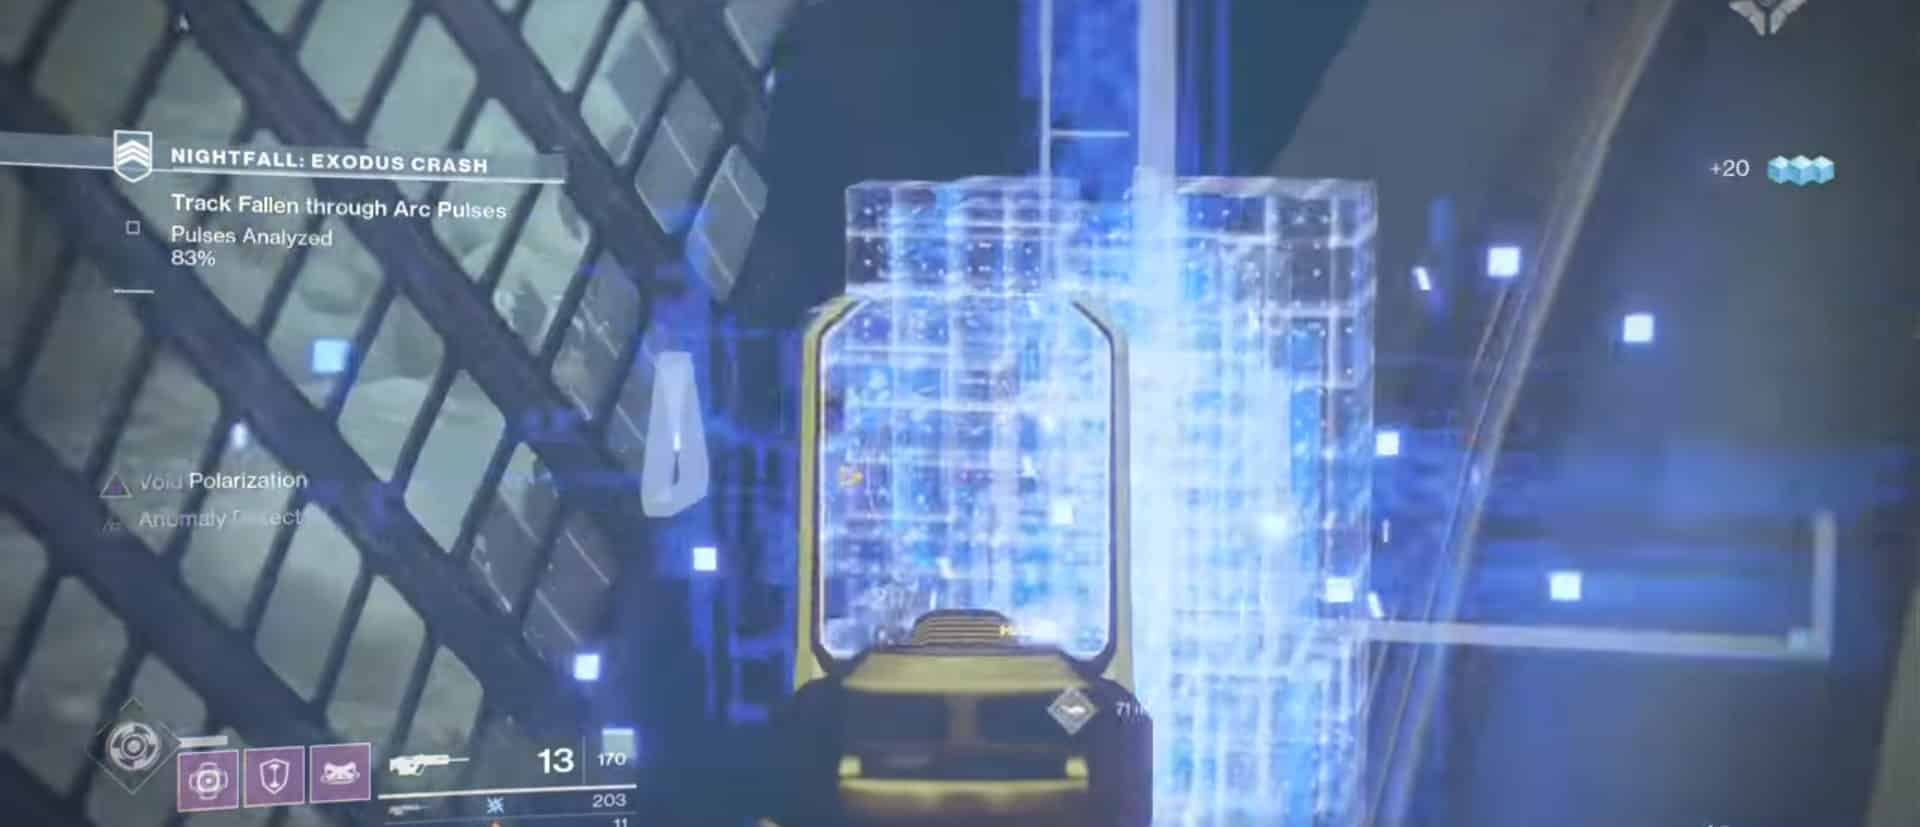 destroy anomalies 30 sec-min